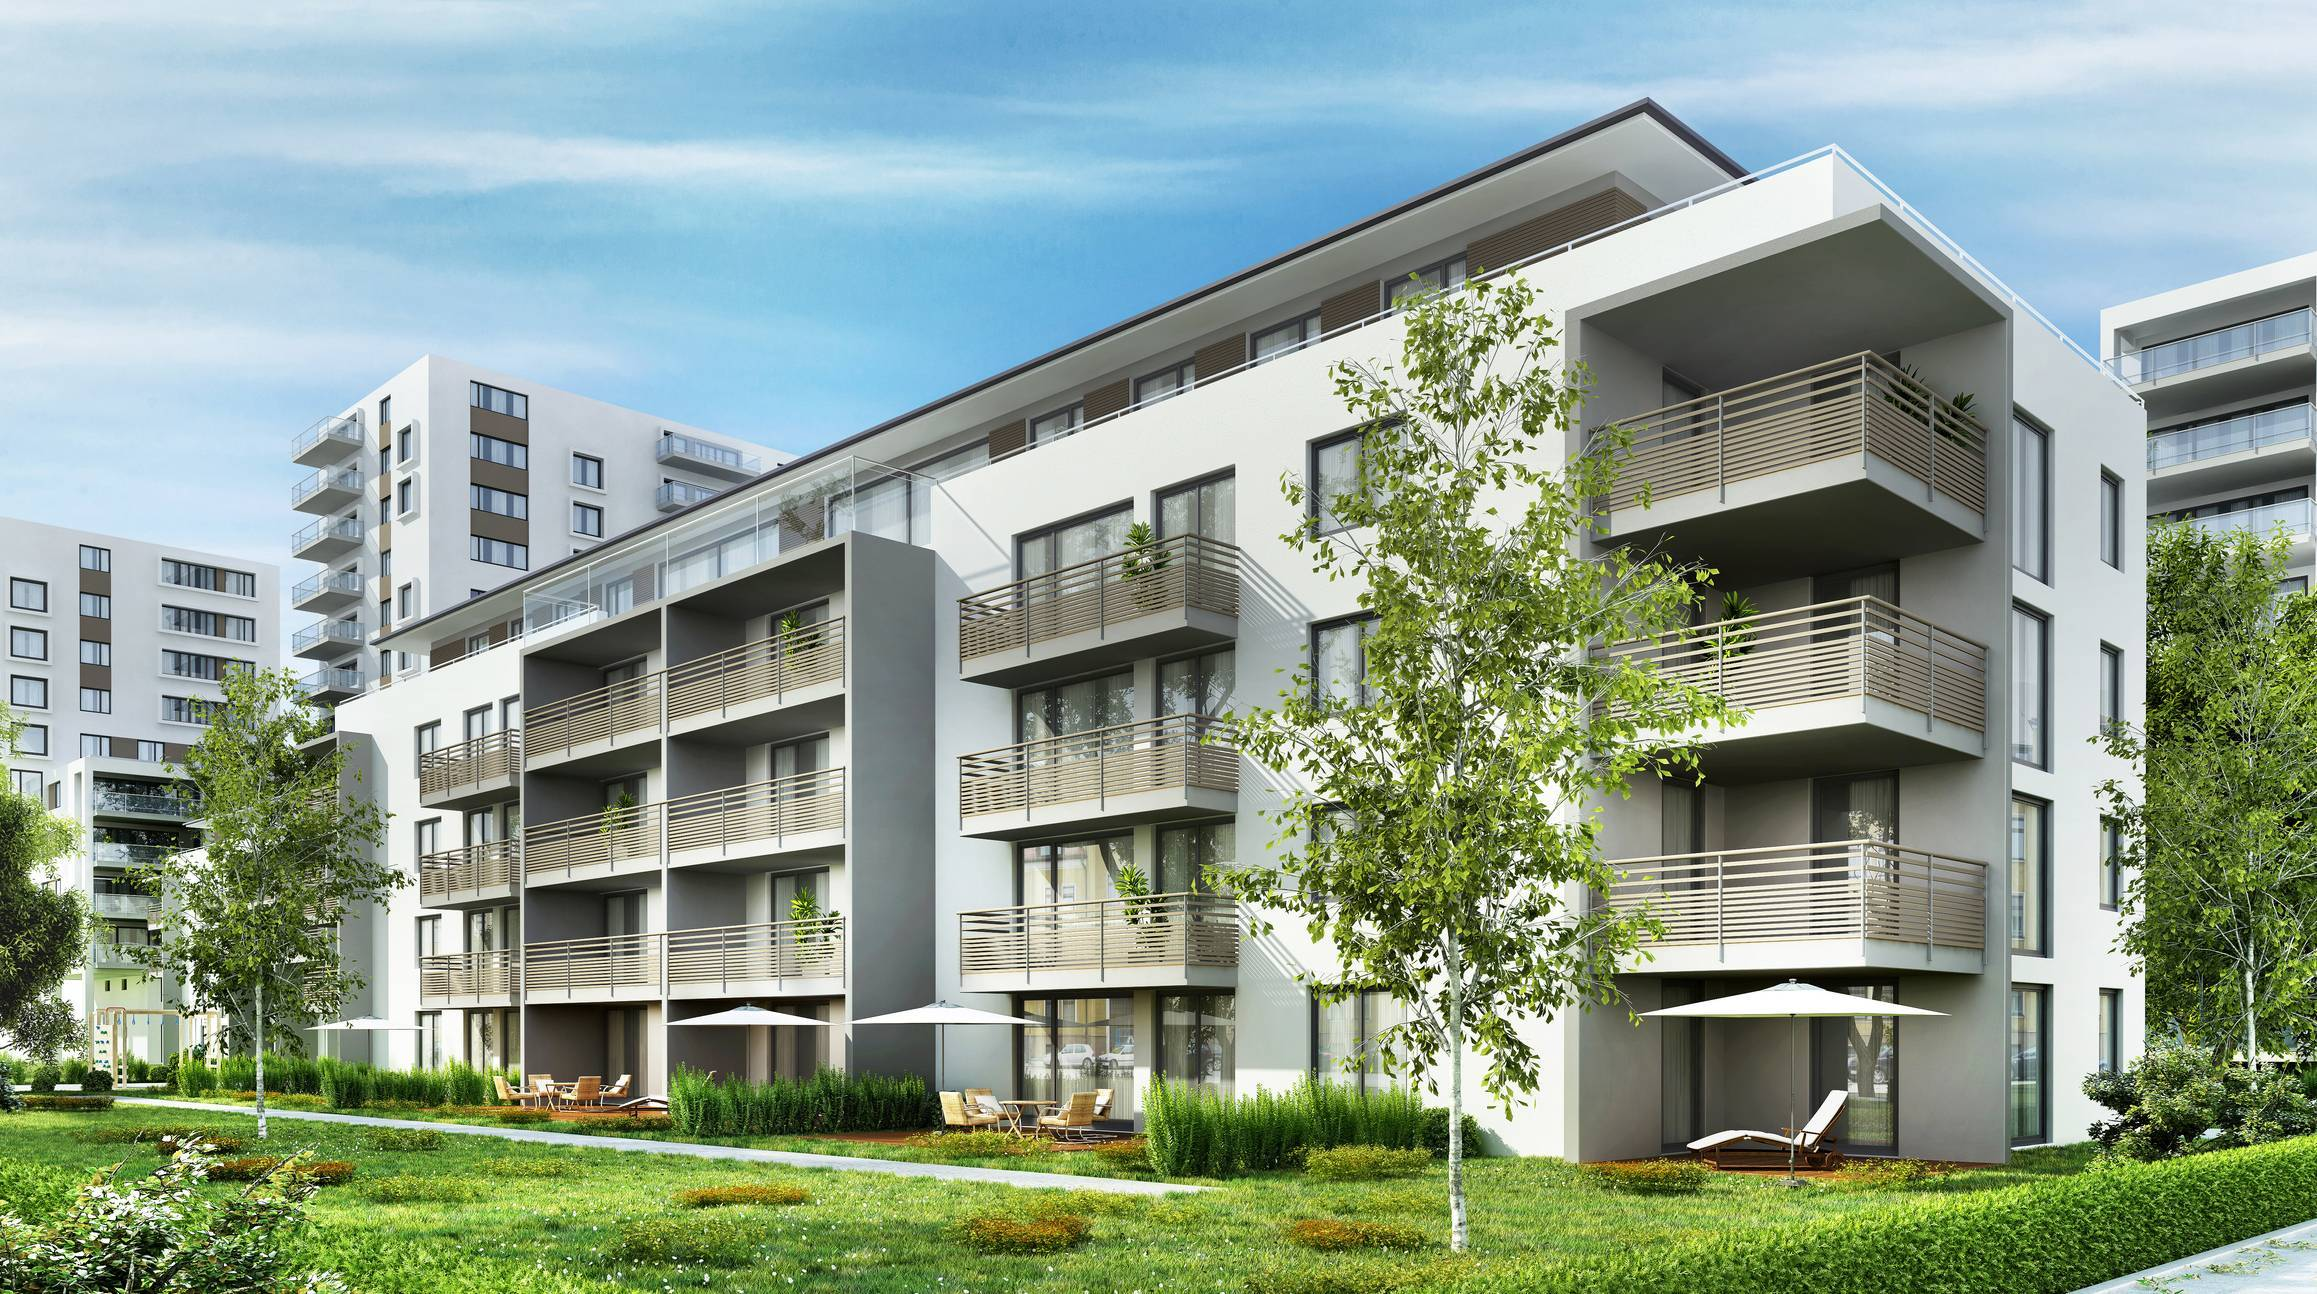 immobilier de rapport investir